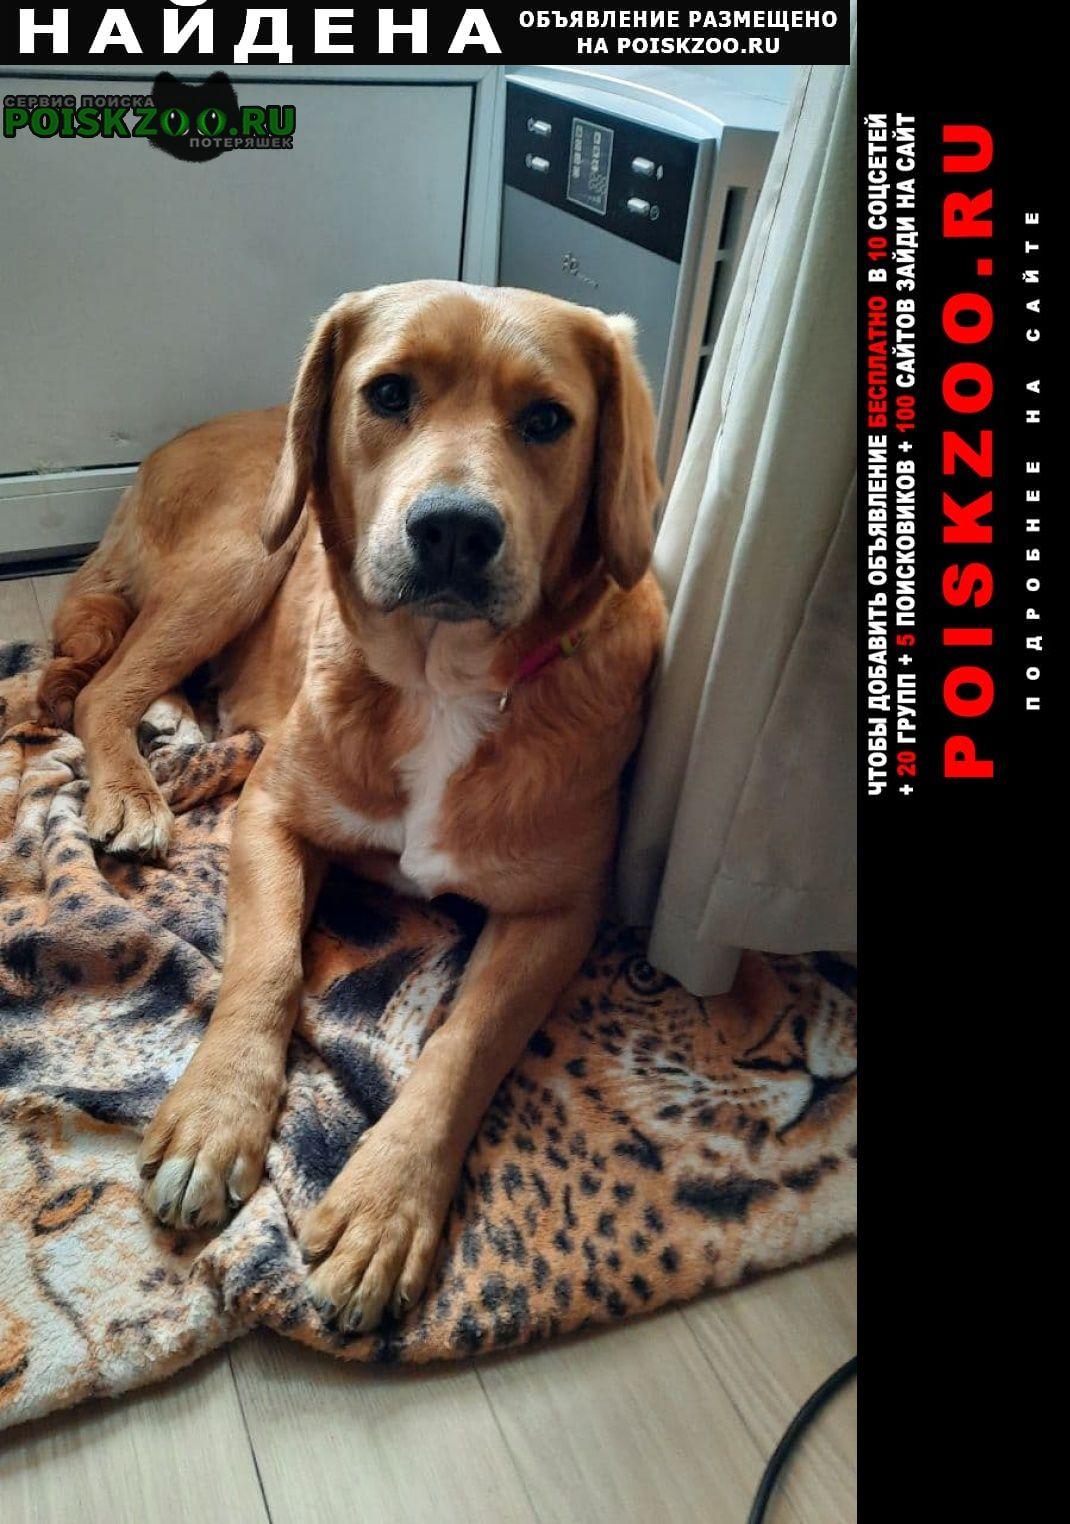 Найдена собака Томилино